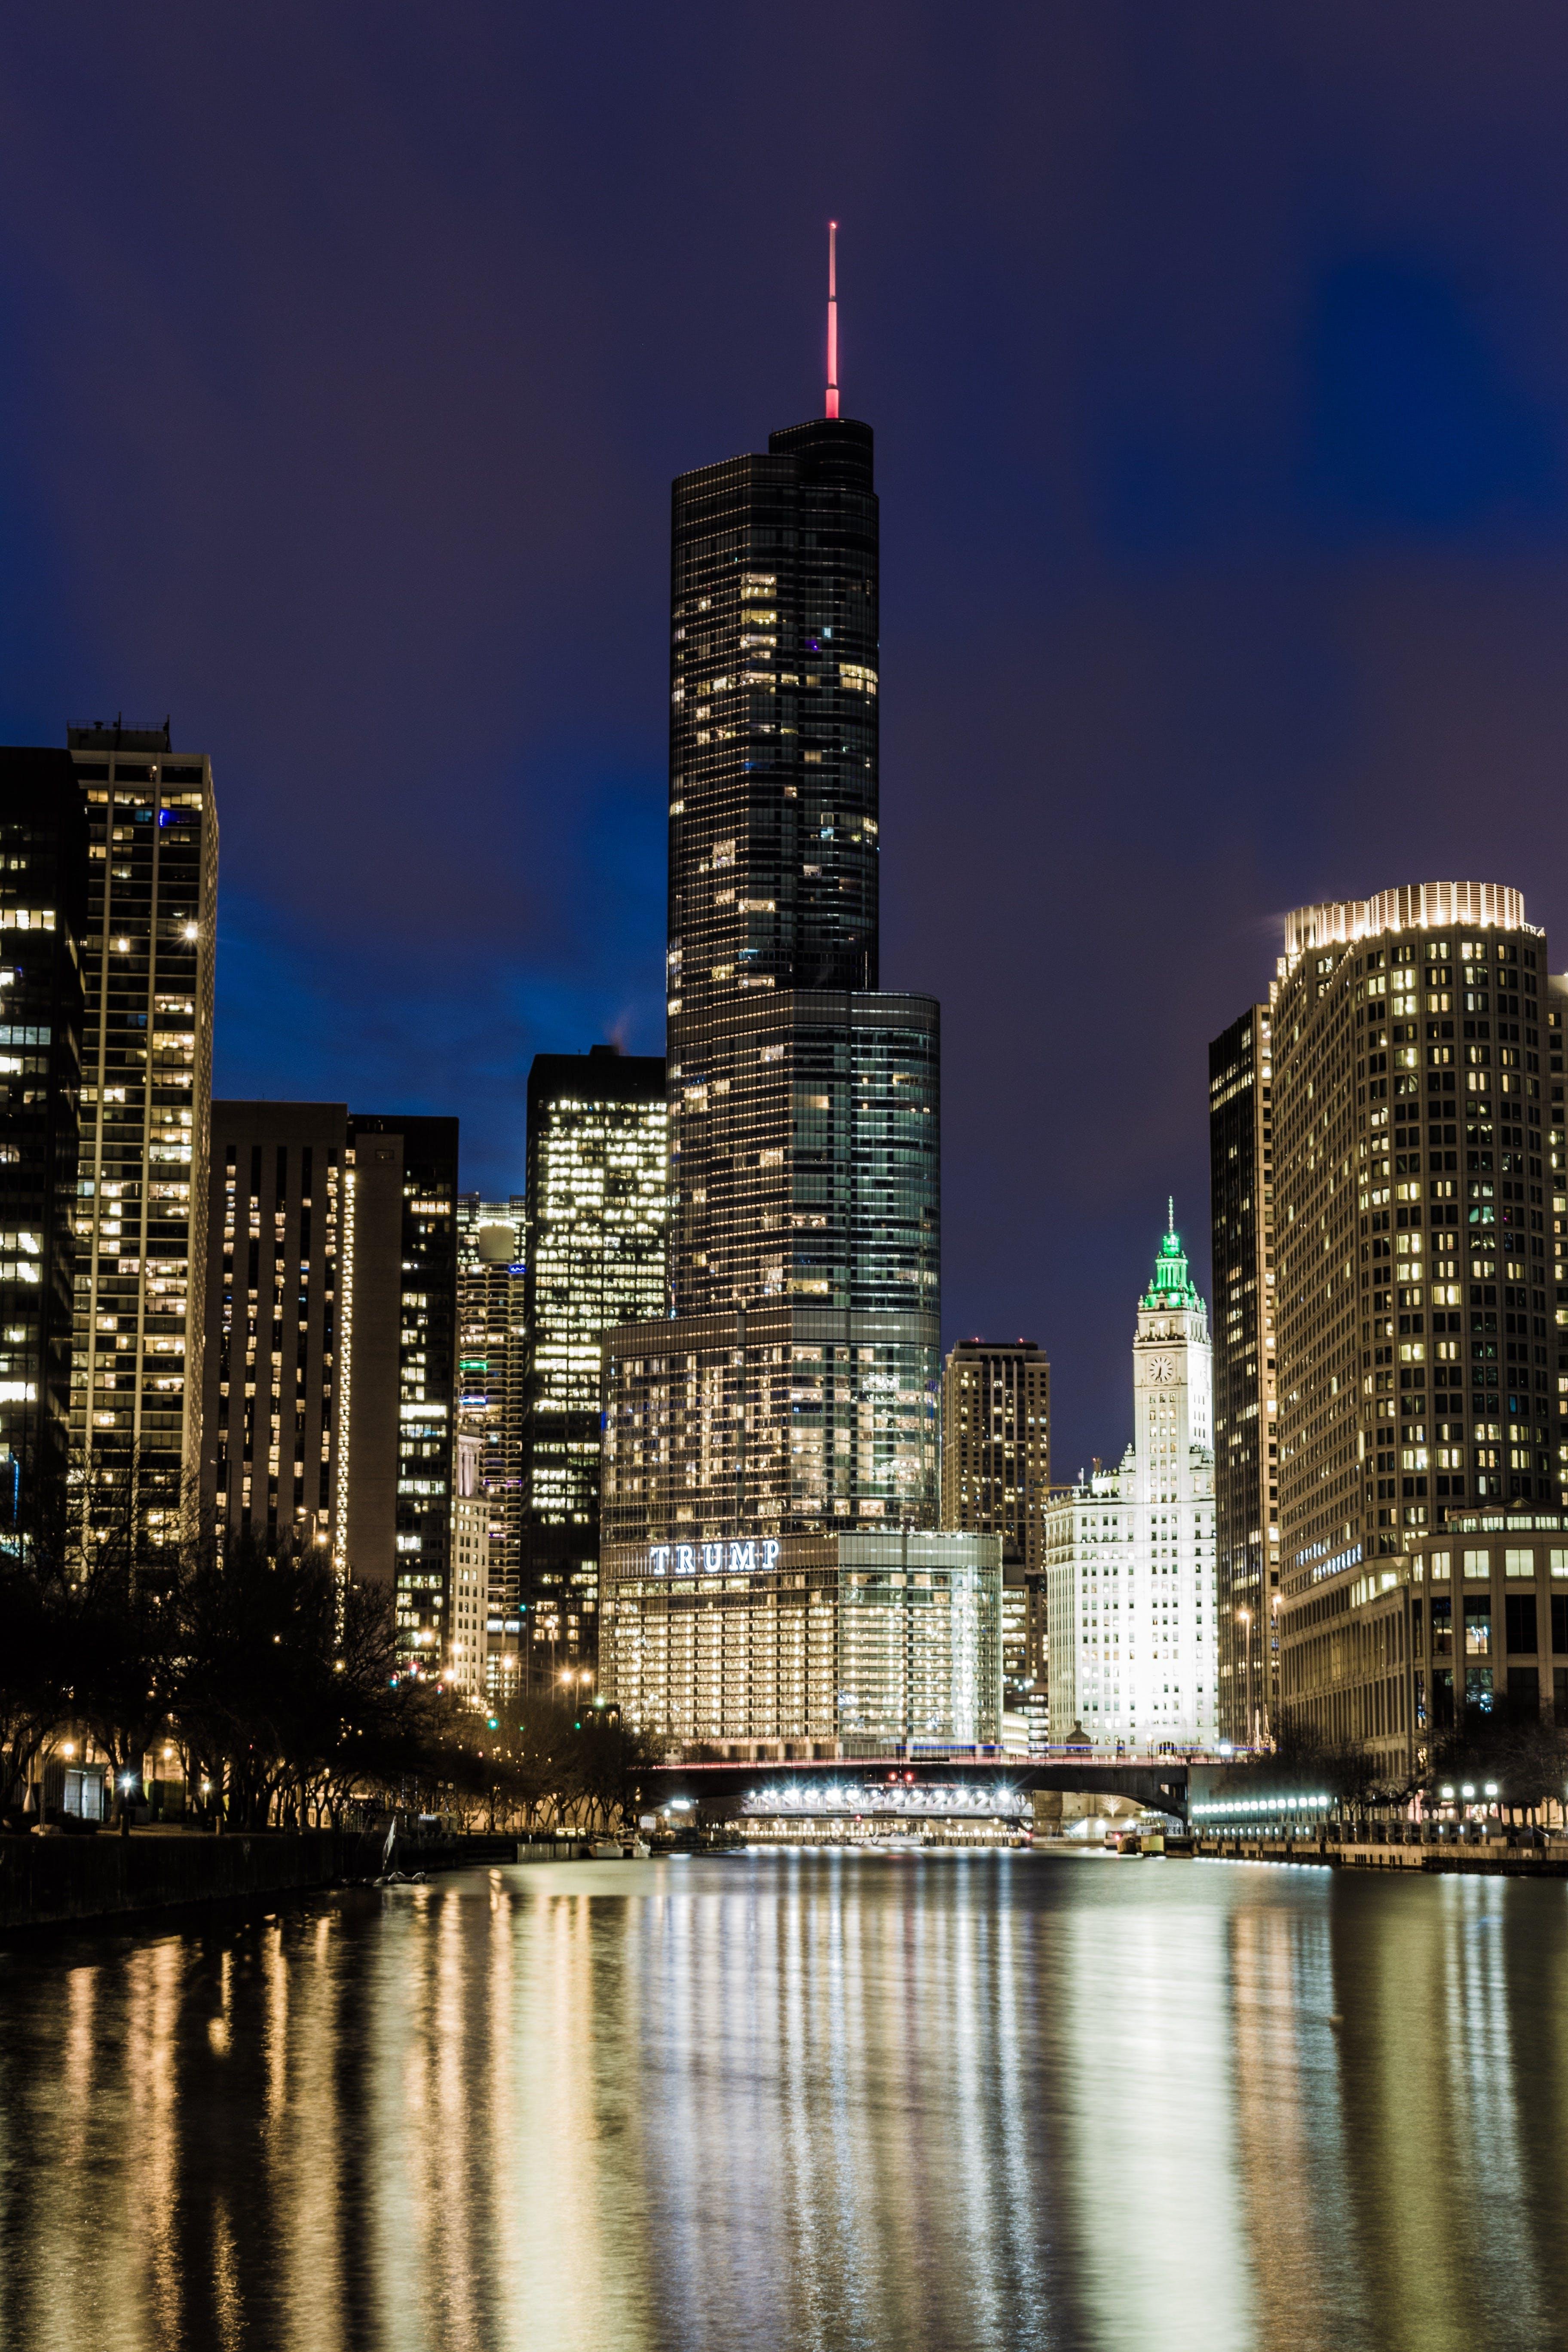 Free stock photo of city, sunset, buildings, purple